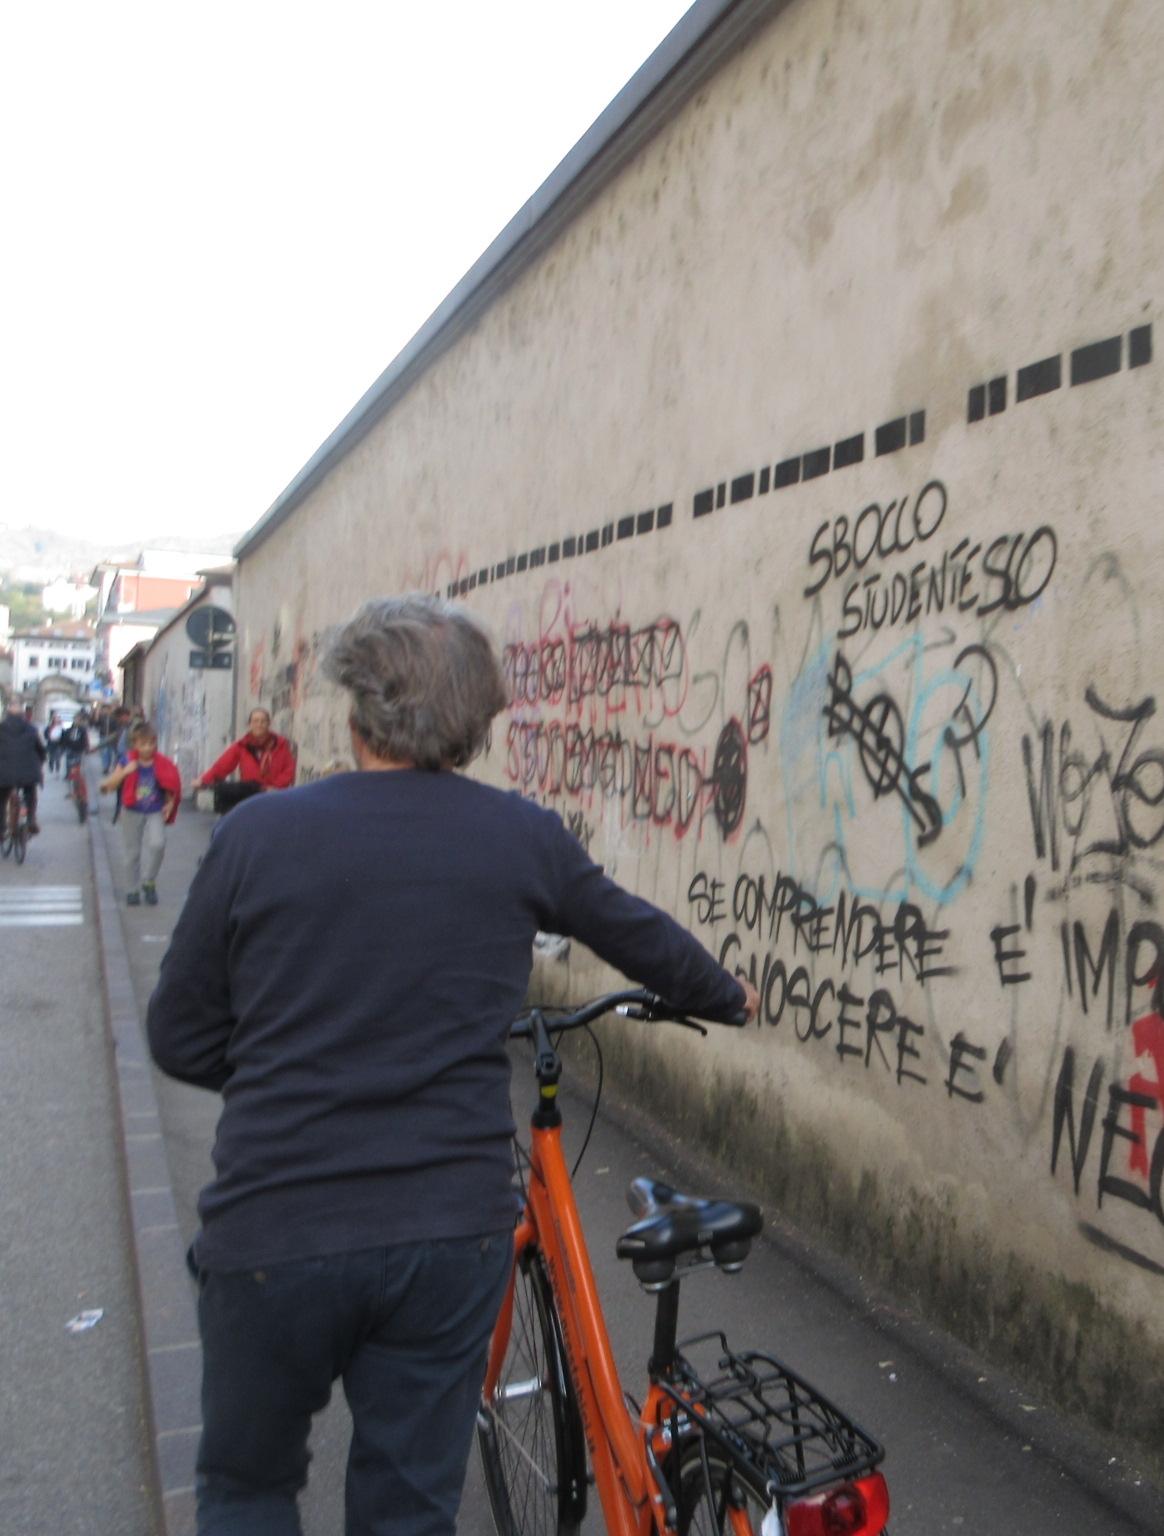 Itinerario di Trento:asse Albere-trePortoni (img sandro aita)